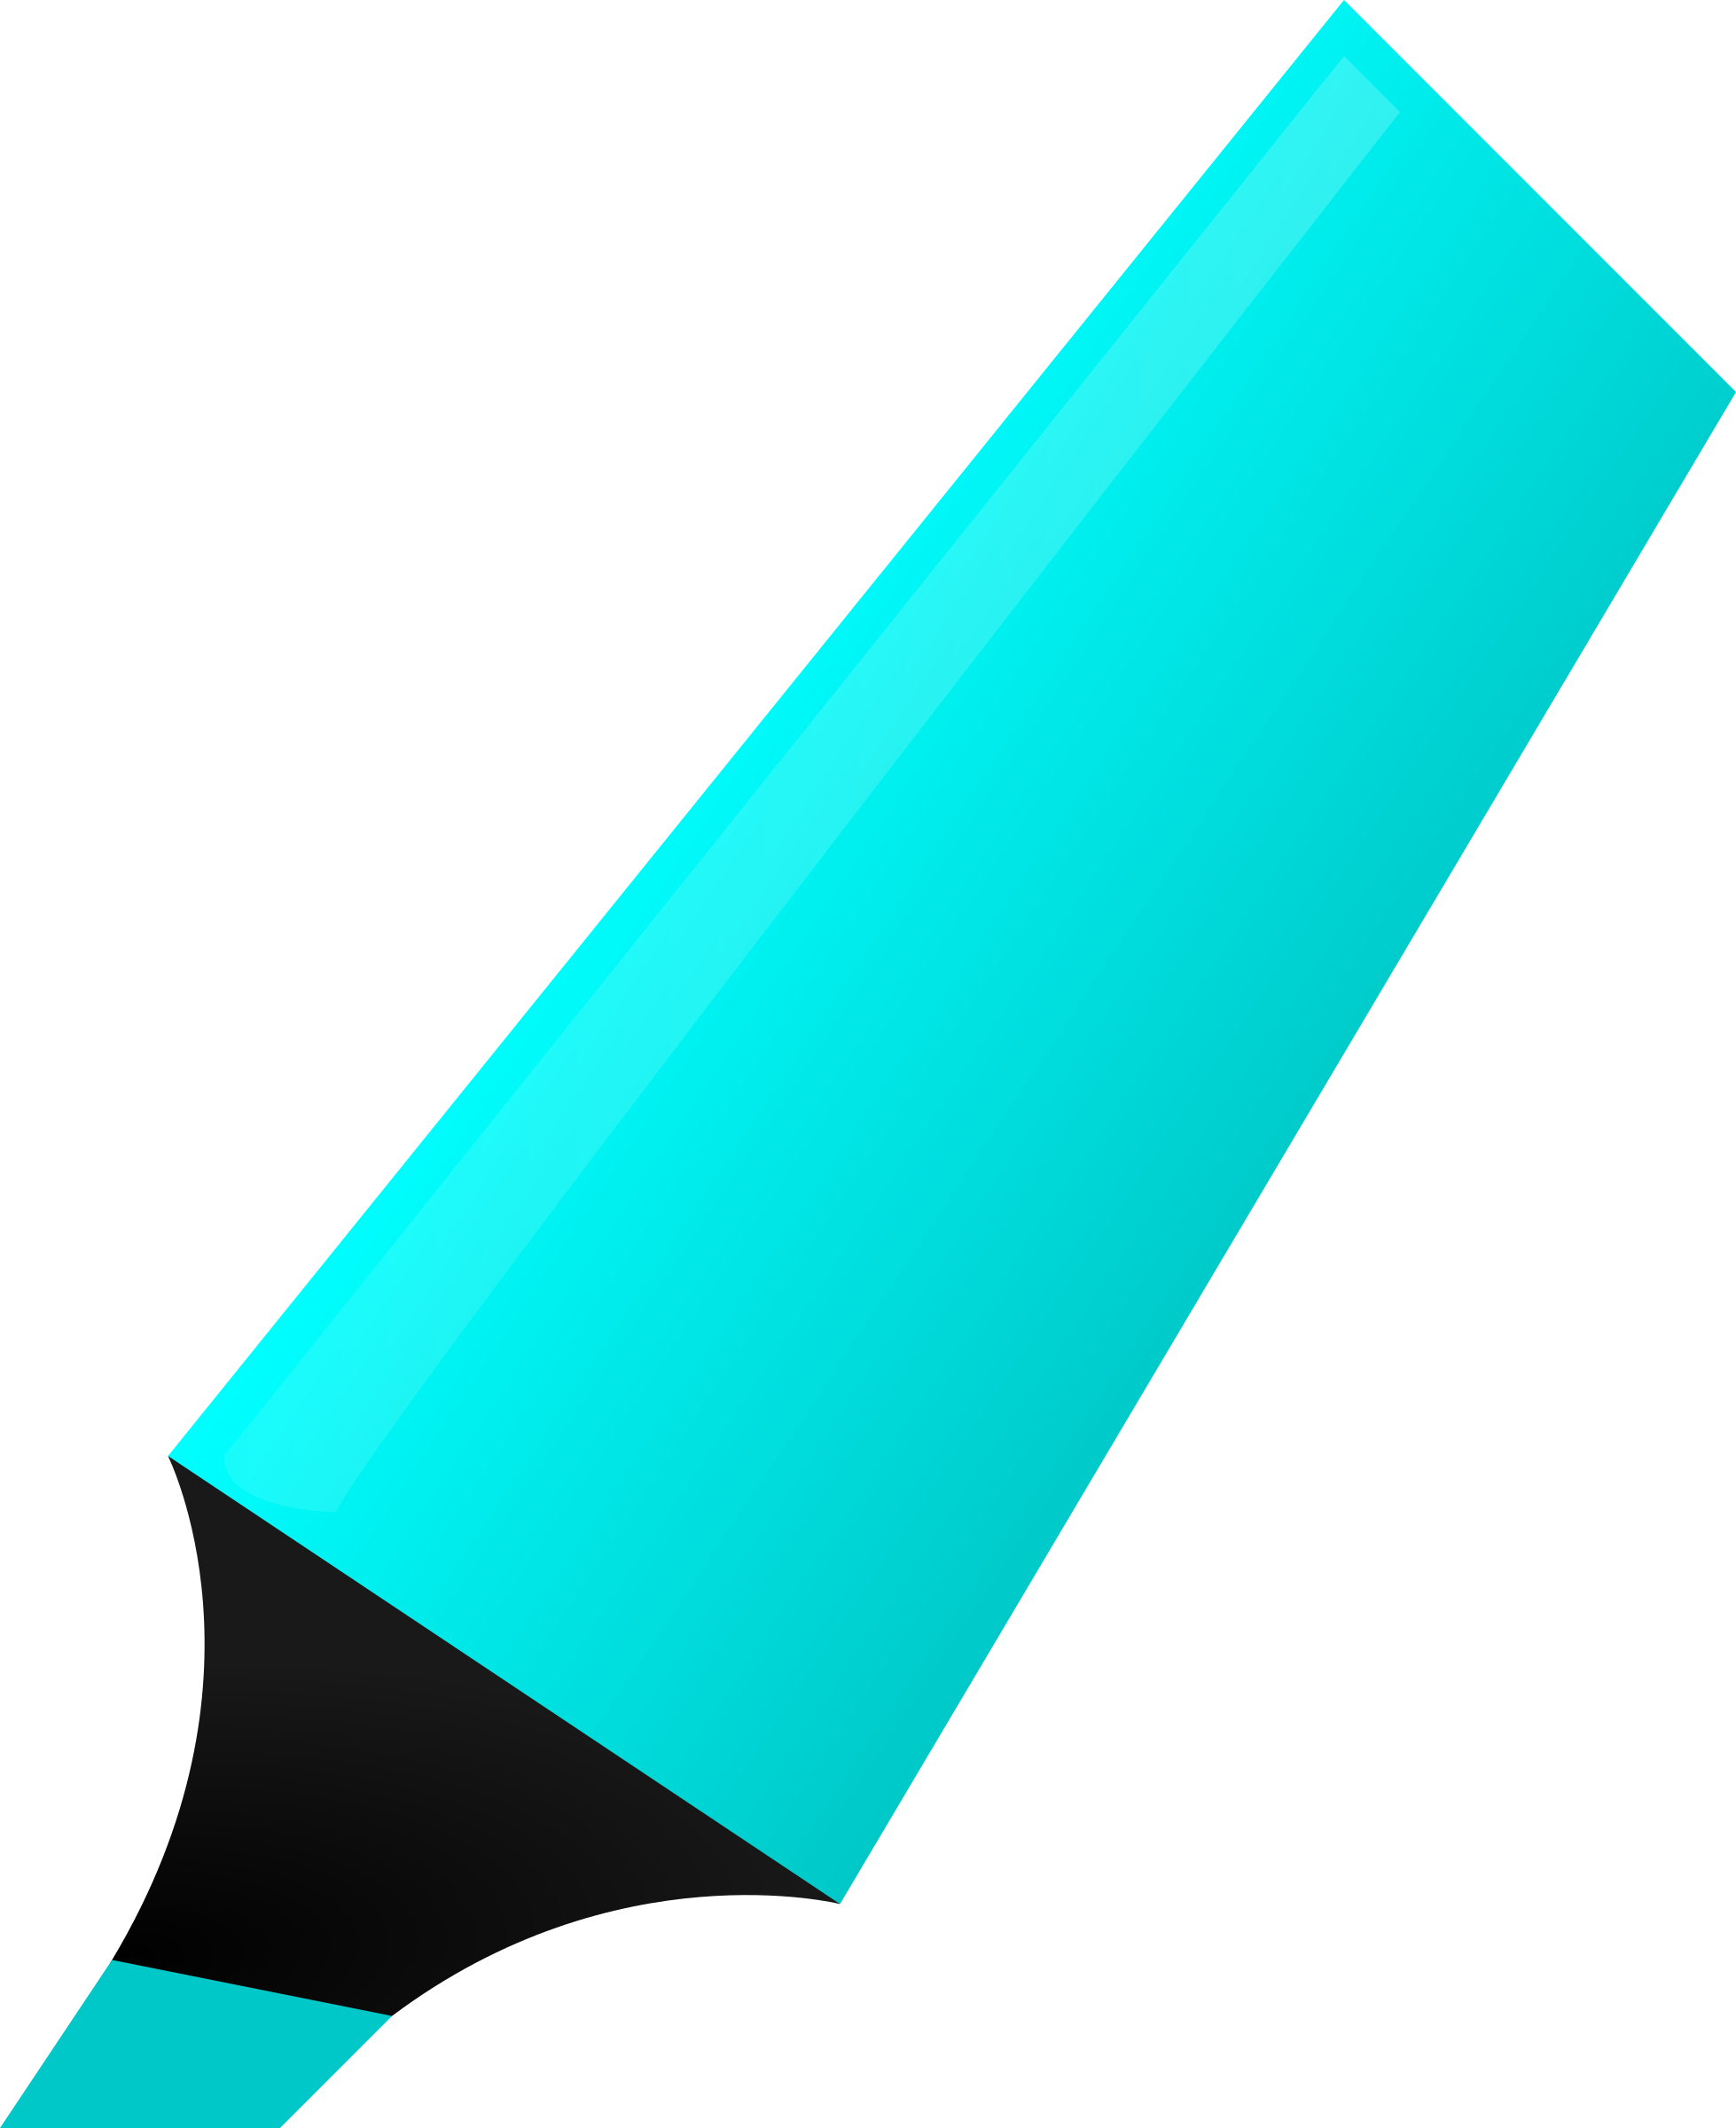 Highlighter clipart clip art transparent stock Highlighter clipart 6 » Clipart Station clip art transparent stock